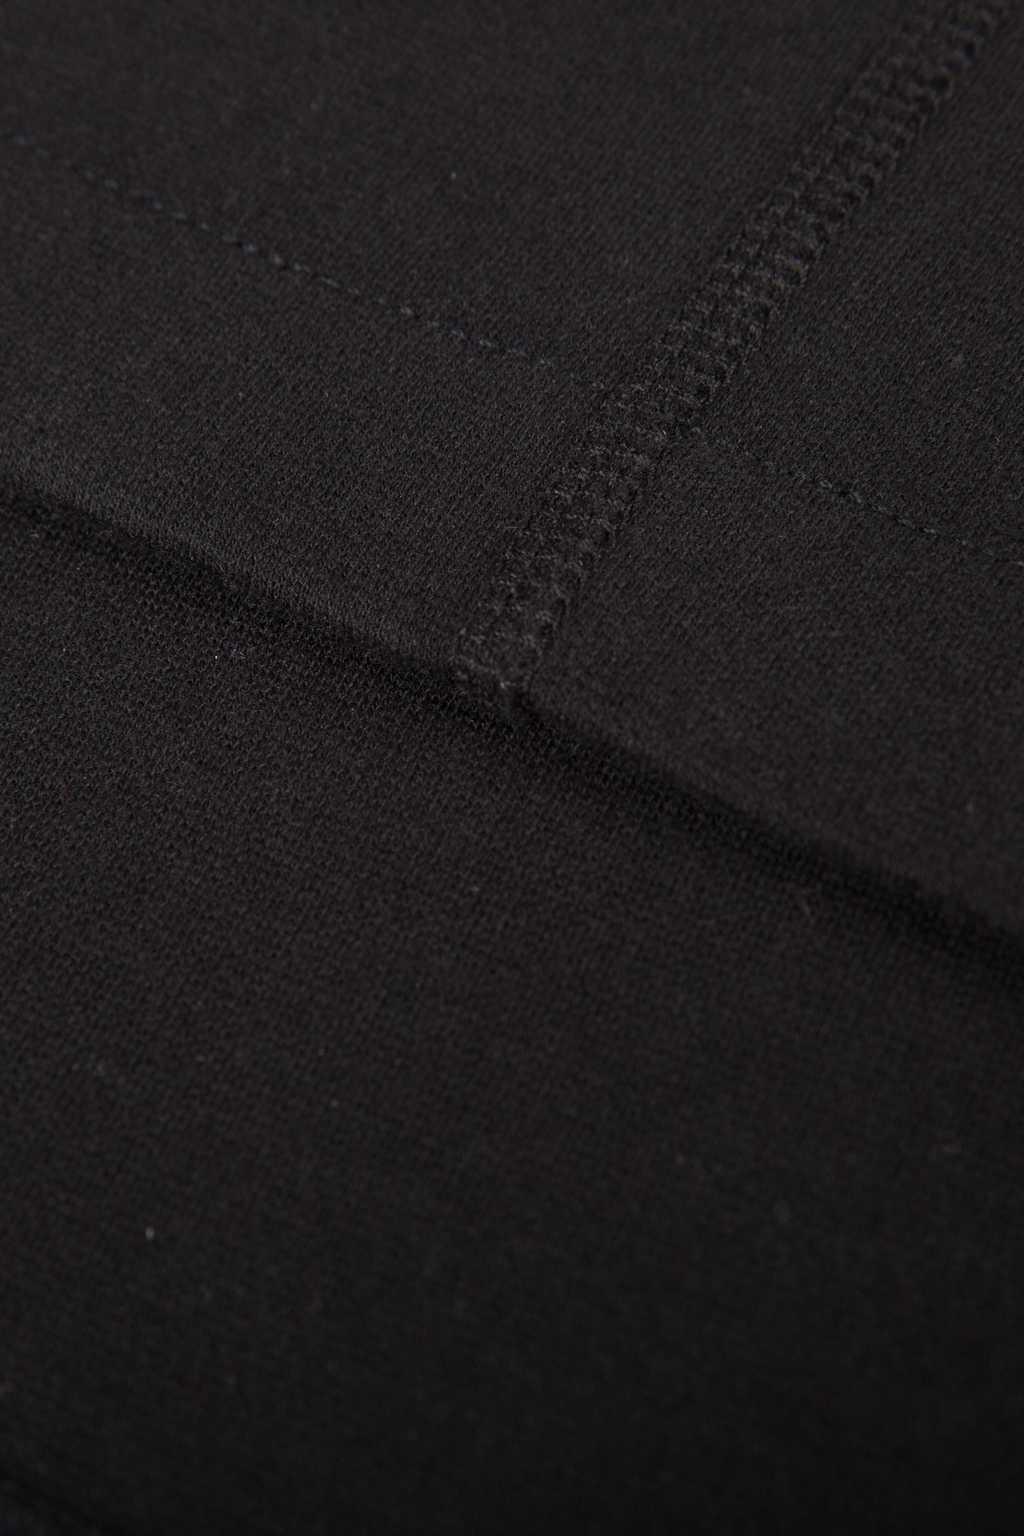 Sweatshirt 1229 Black 5